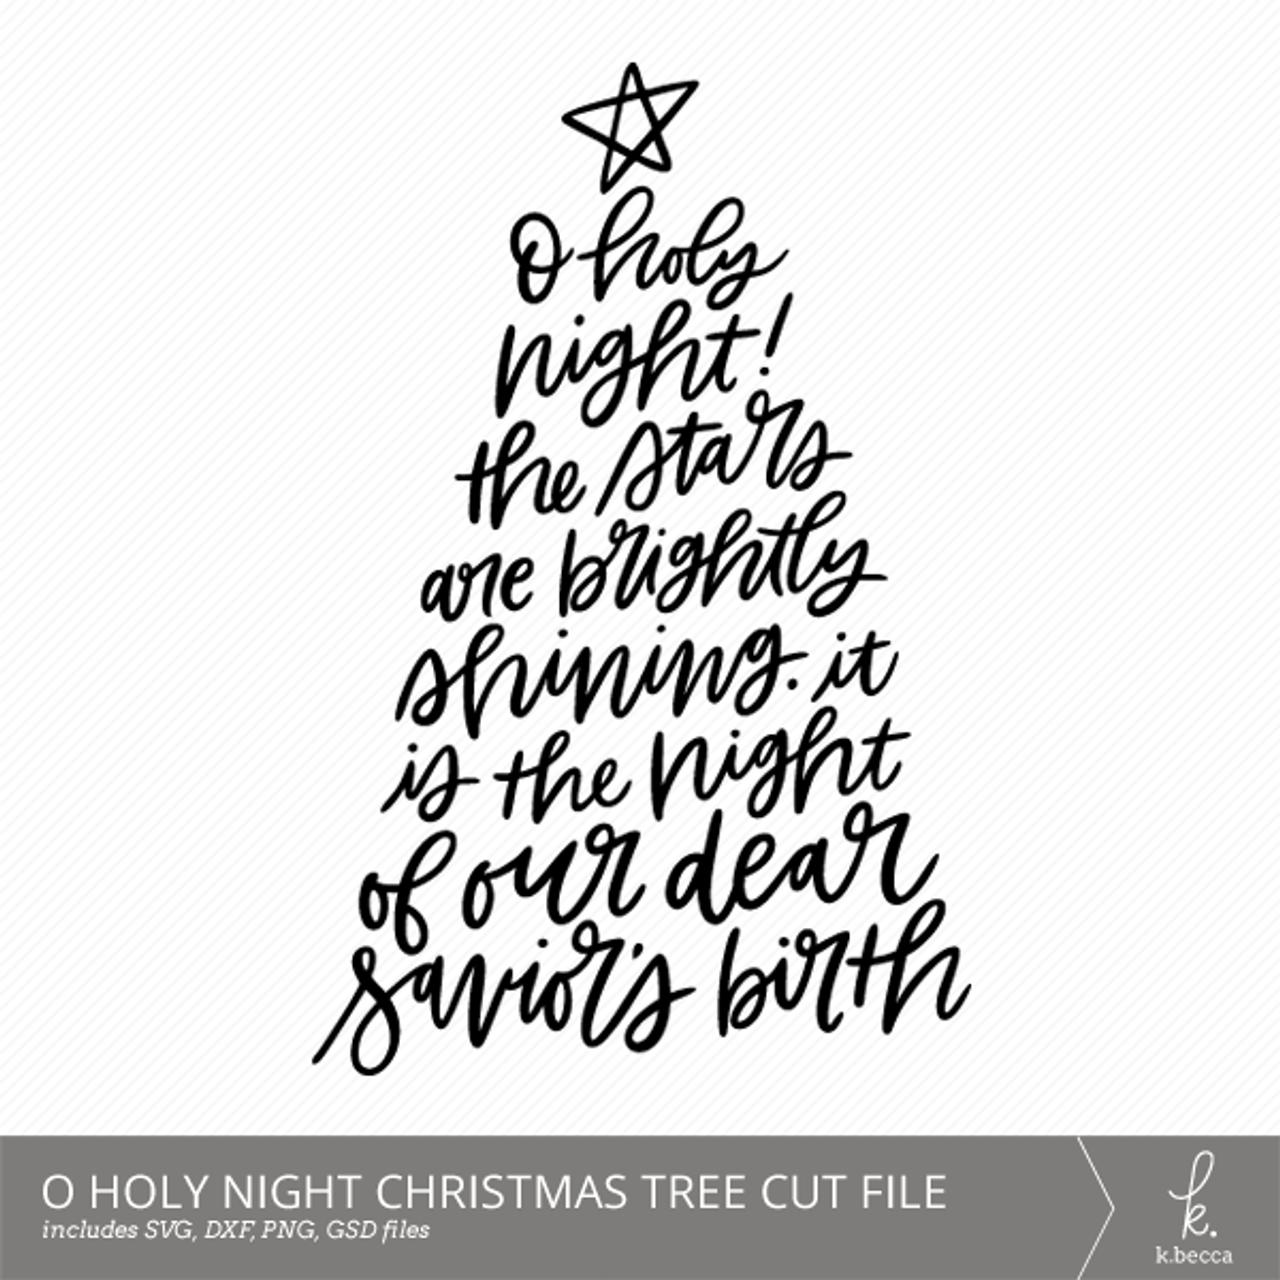 O Holy Night Christmas Tree Cut Files - k.becca